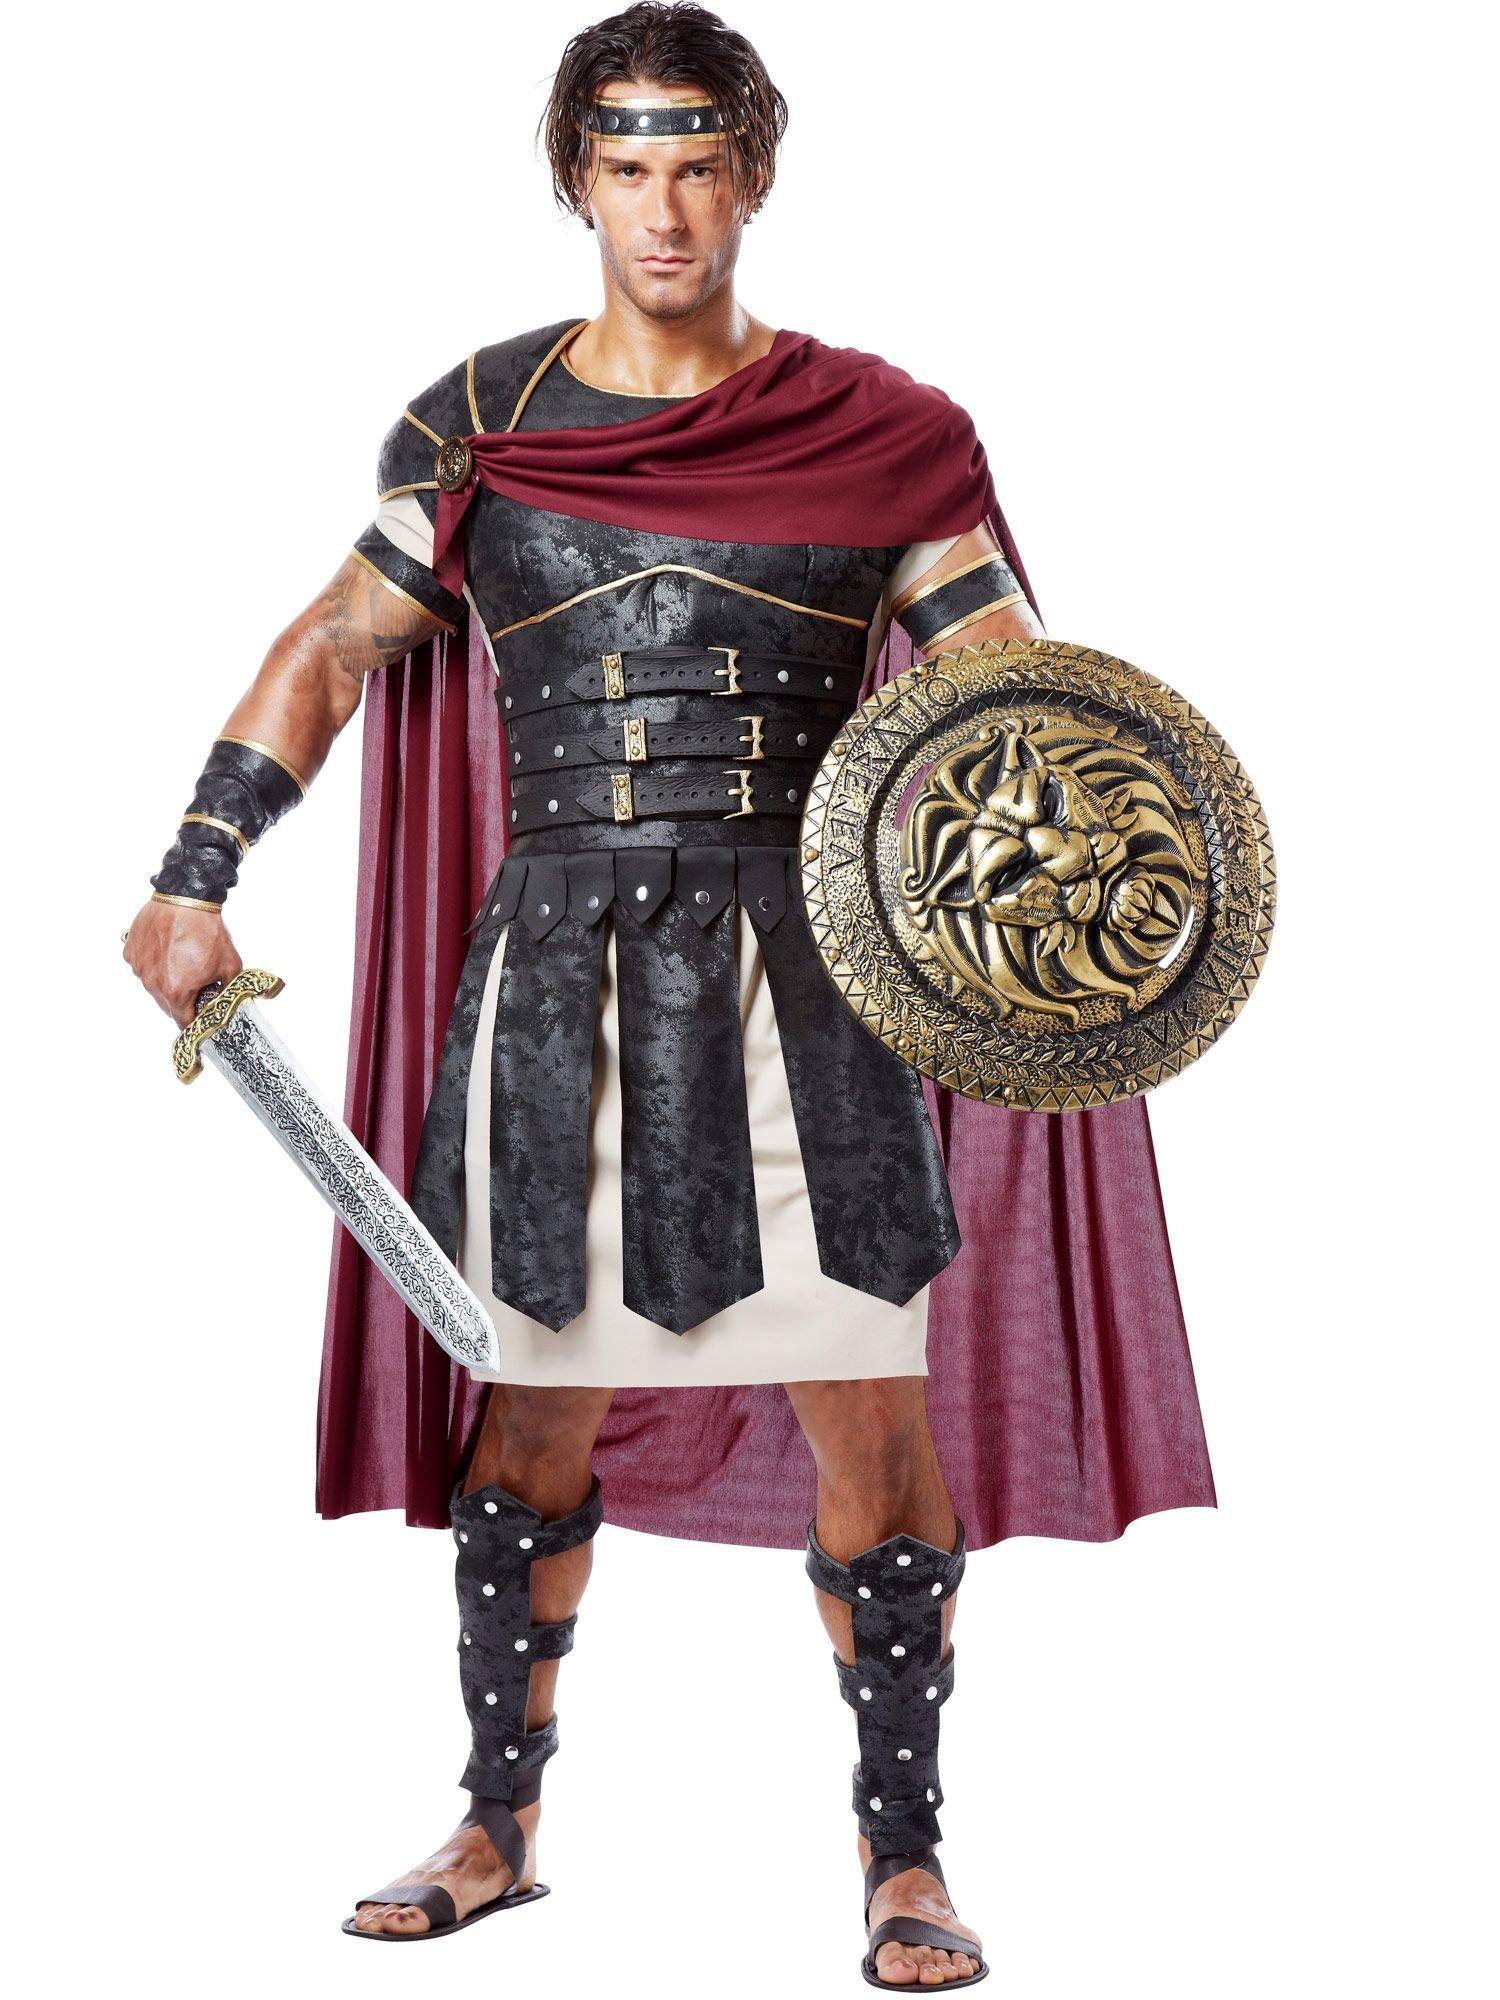 California Costumes Men's Roman Gladiator Adult, Black/Burgundy, Large